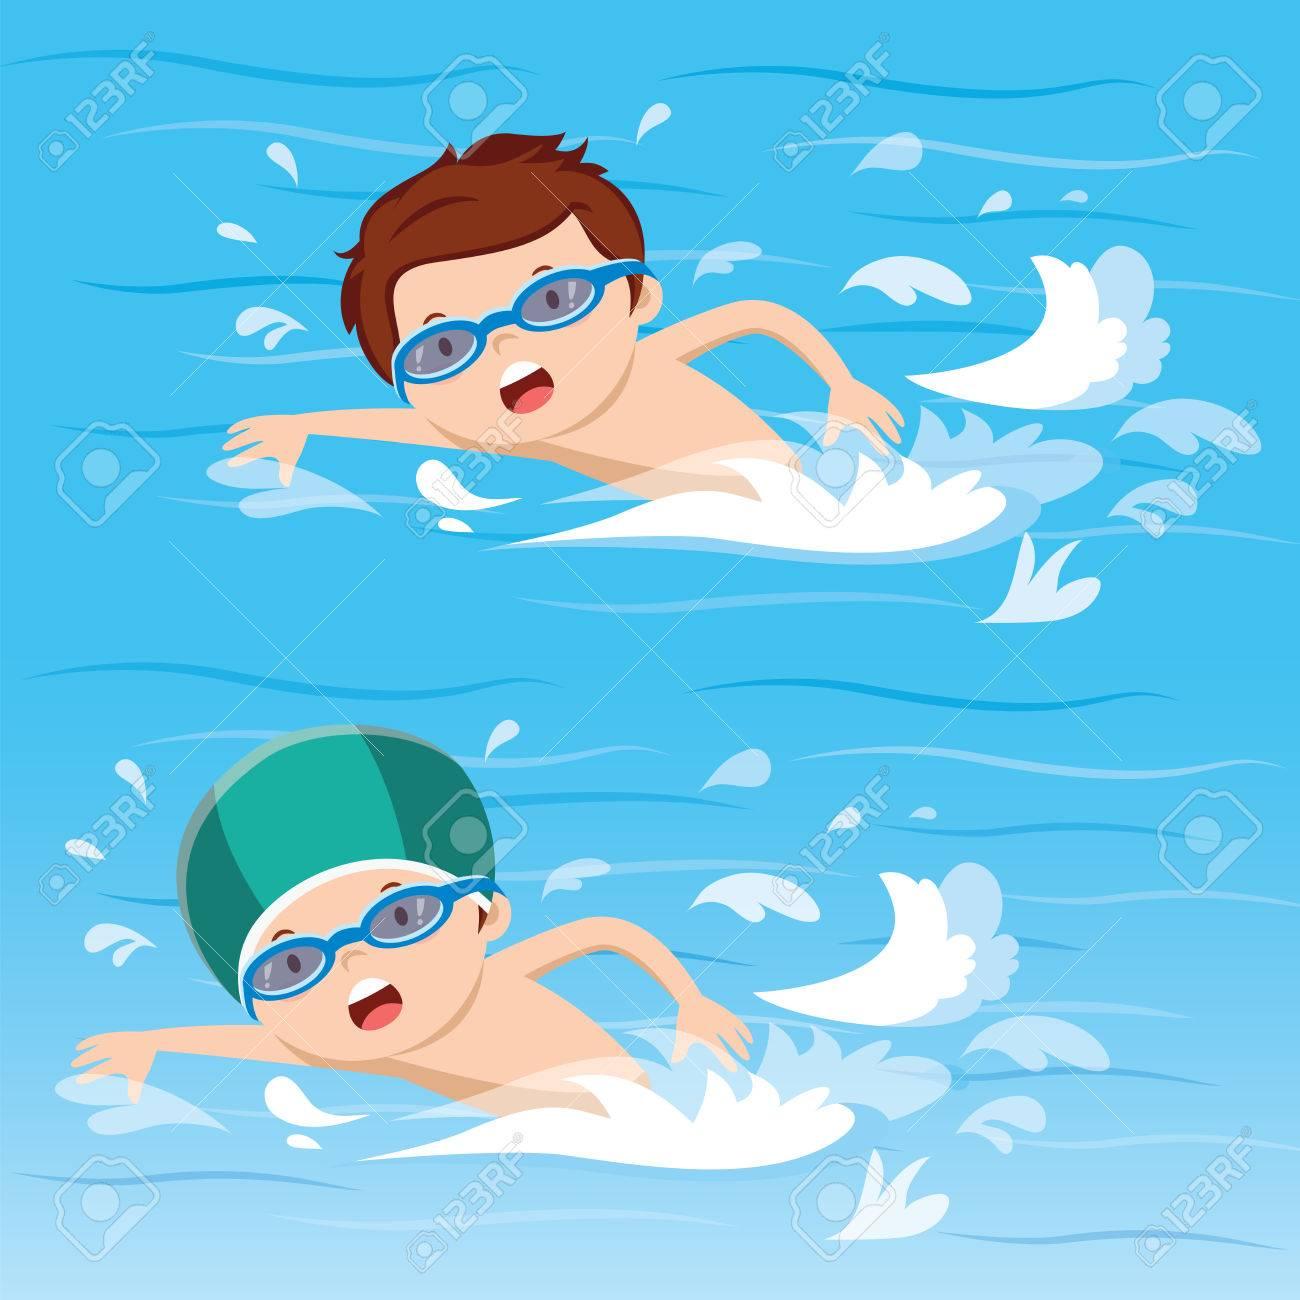 Boy swimming in the pool - 73778664